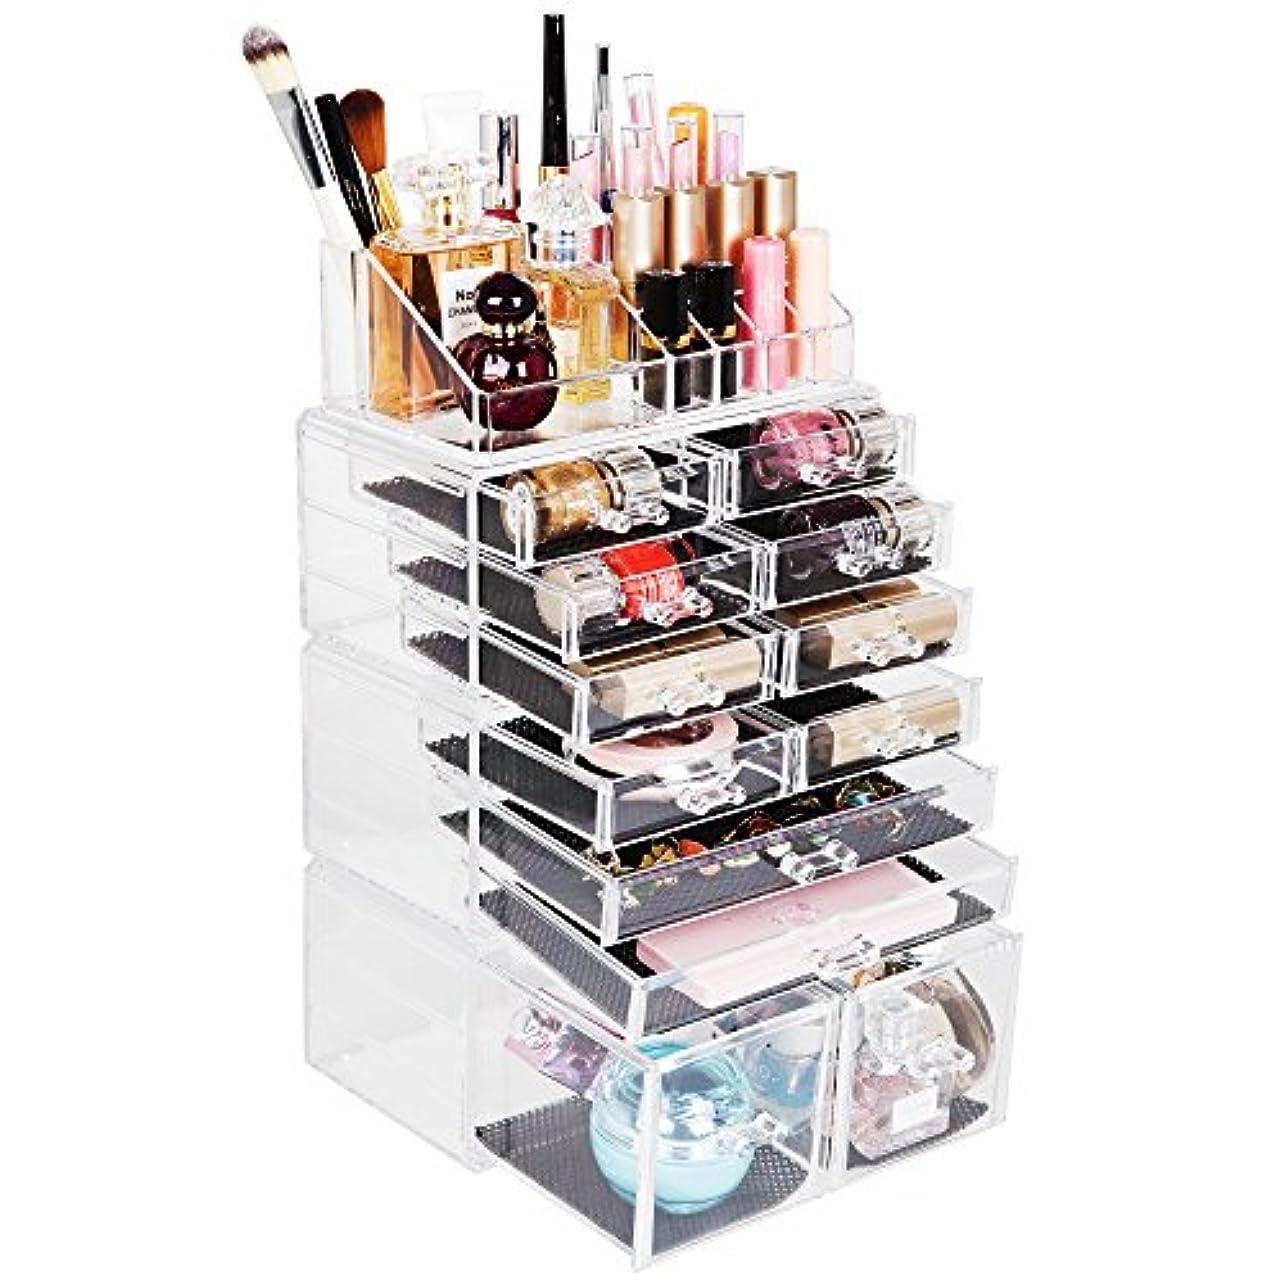 Reodoeer 化粧品収納ボックス メイクケース メイクボックス 化粧品入れ コスメ収納スタンド(透明)